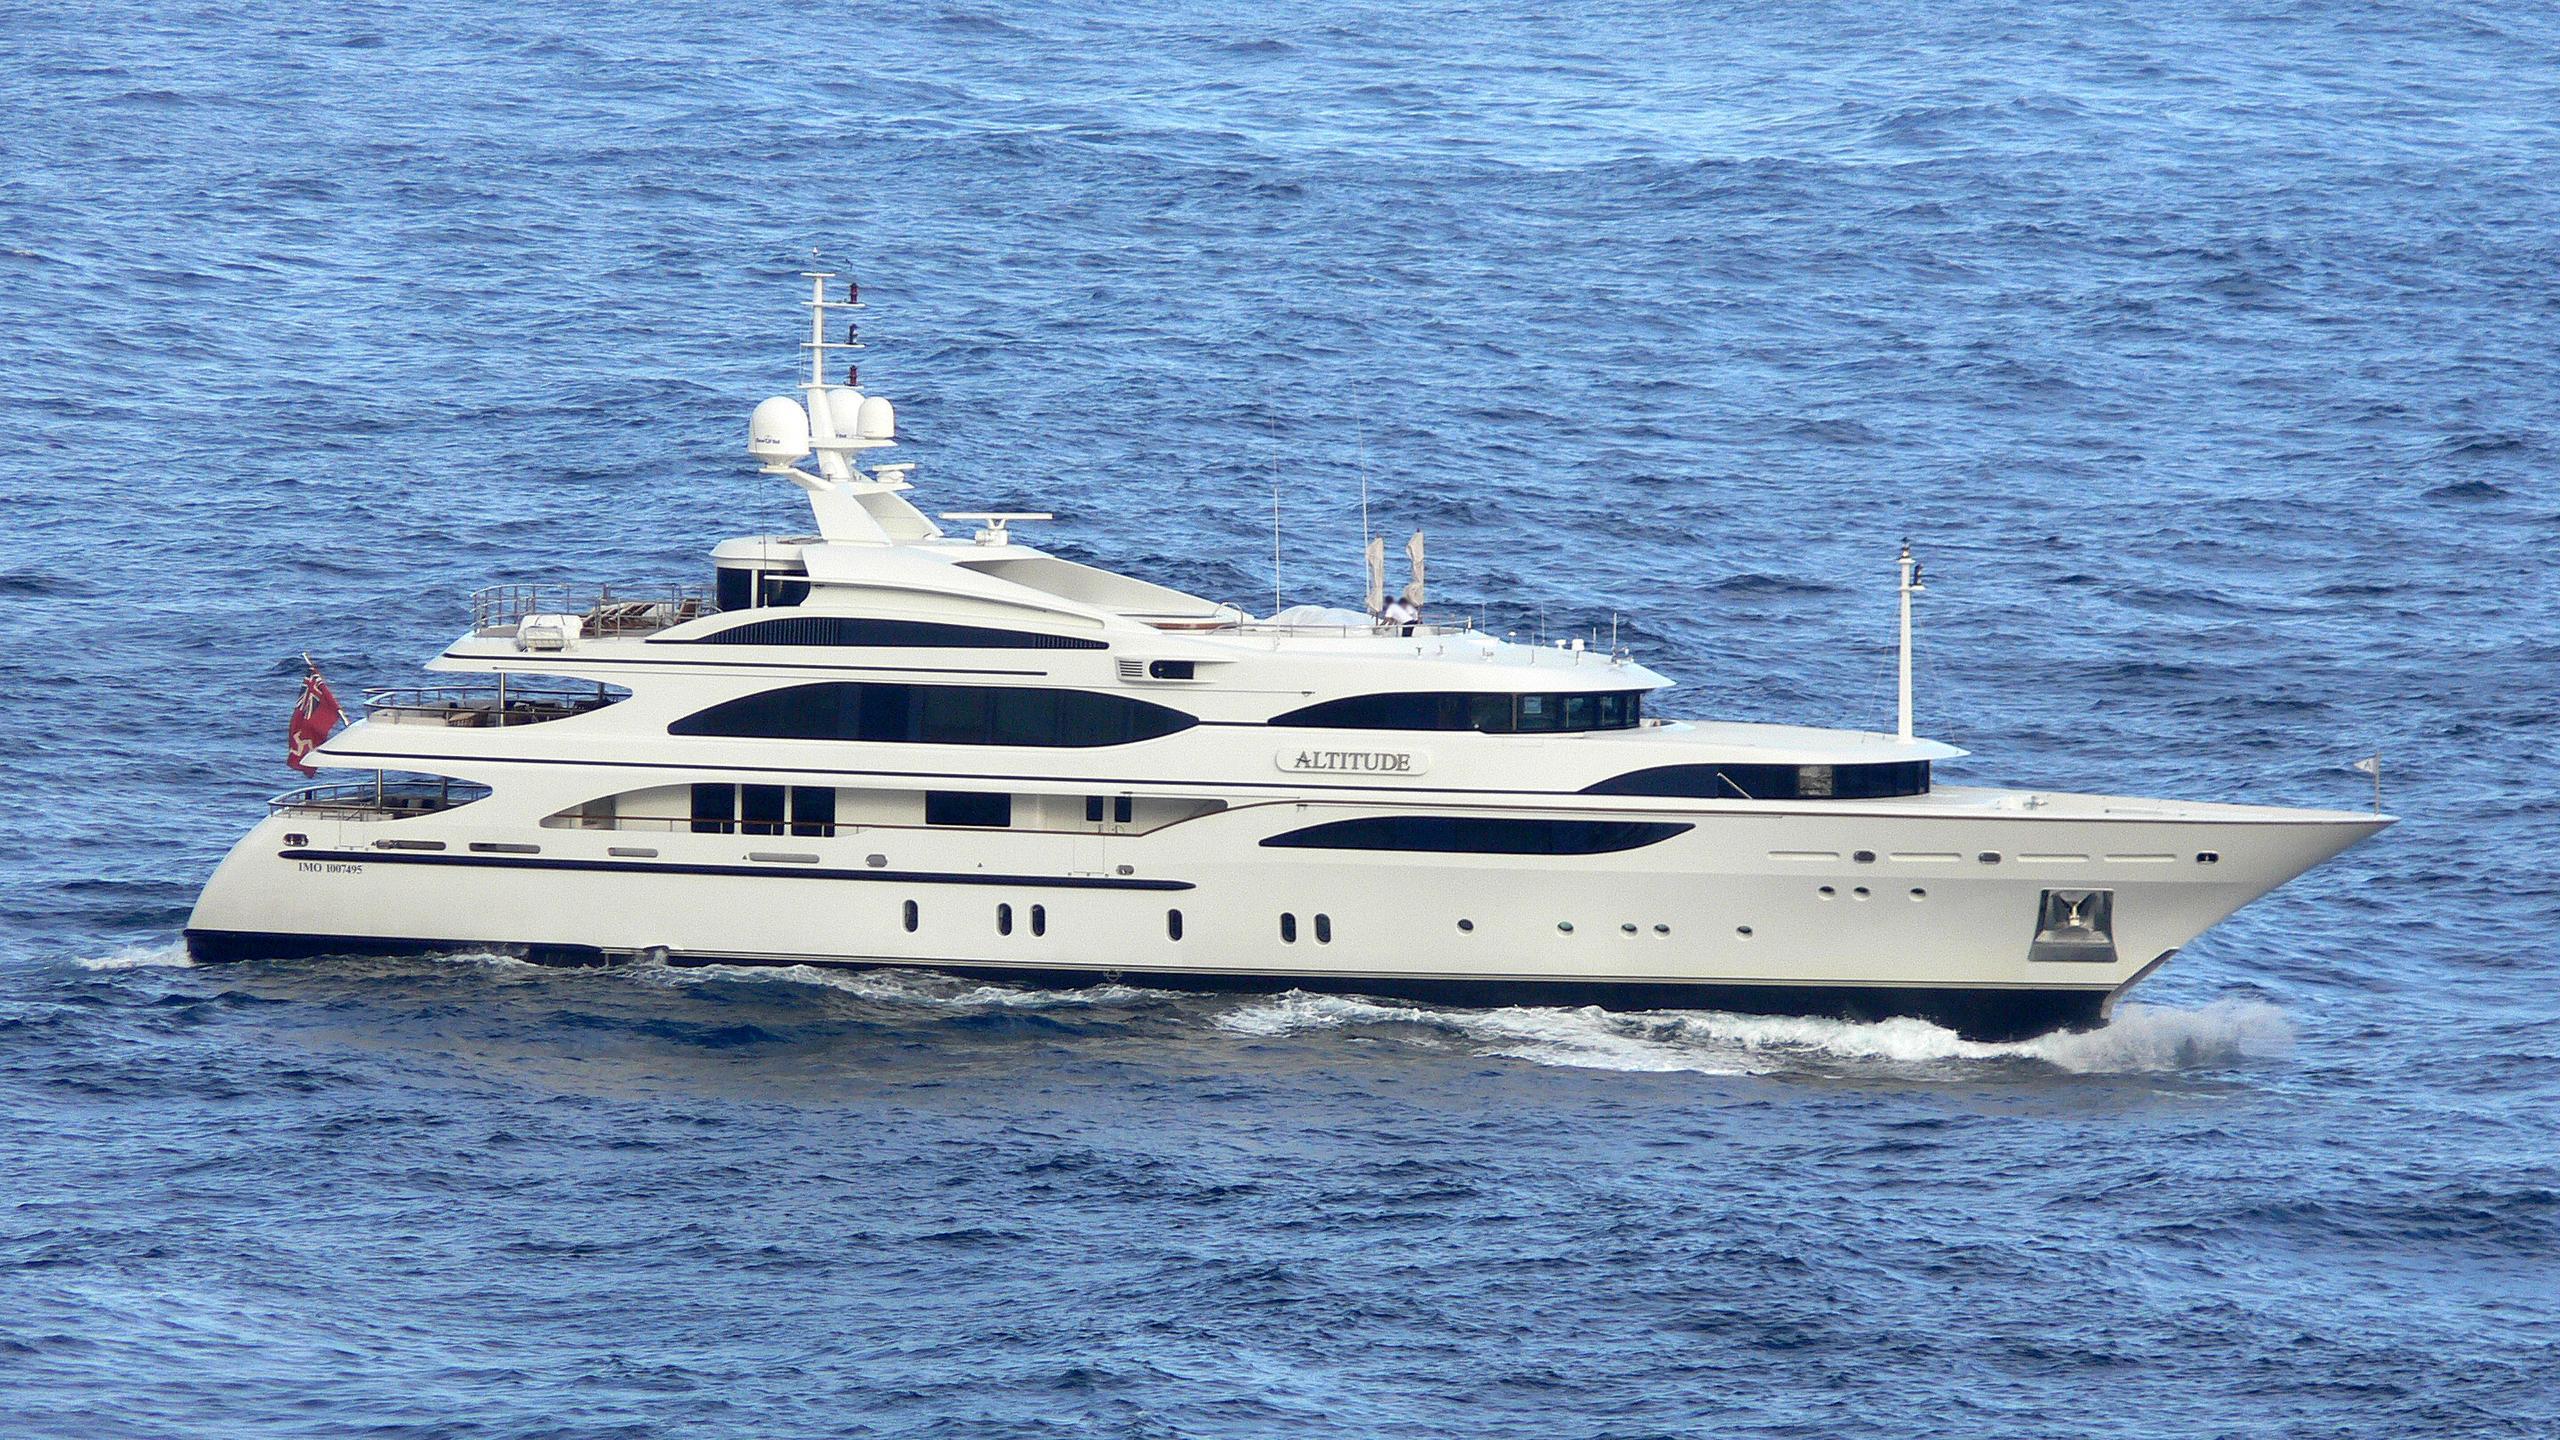 lady-michelle-cakewalk-altitude-yacht-exterior